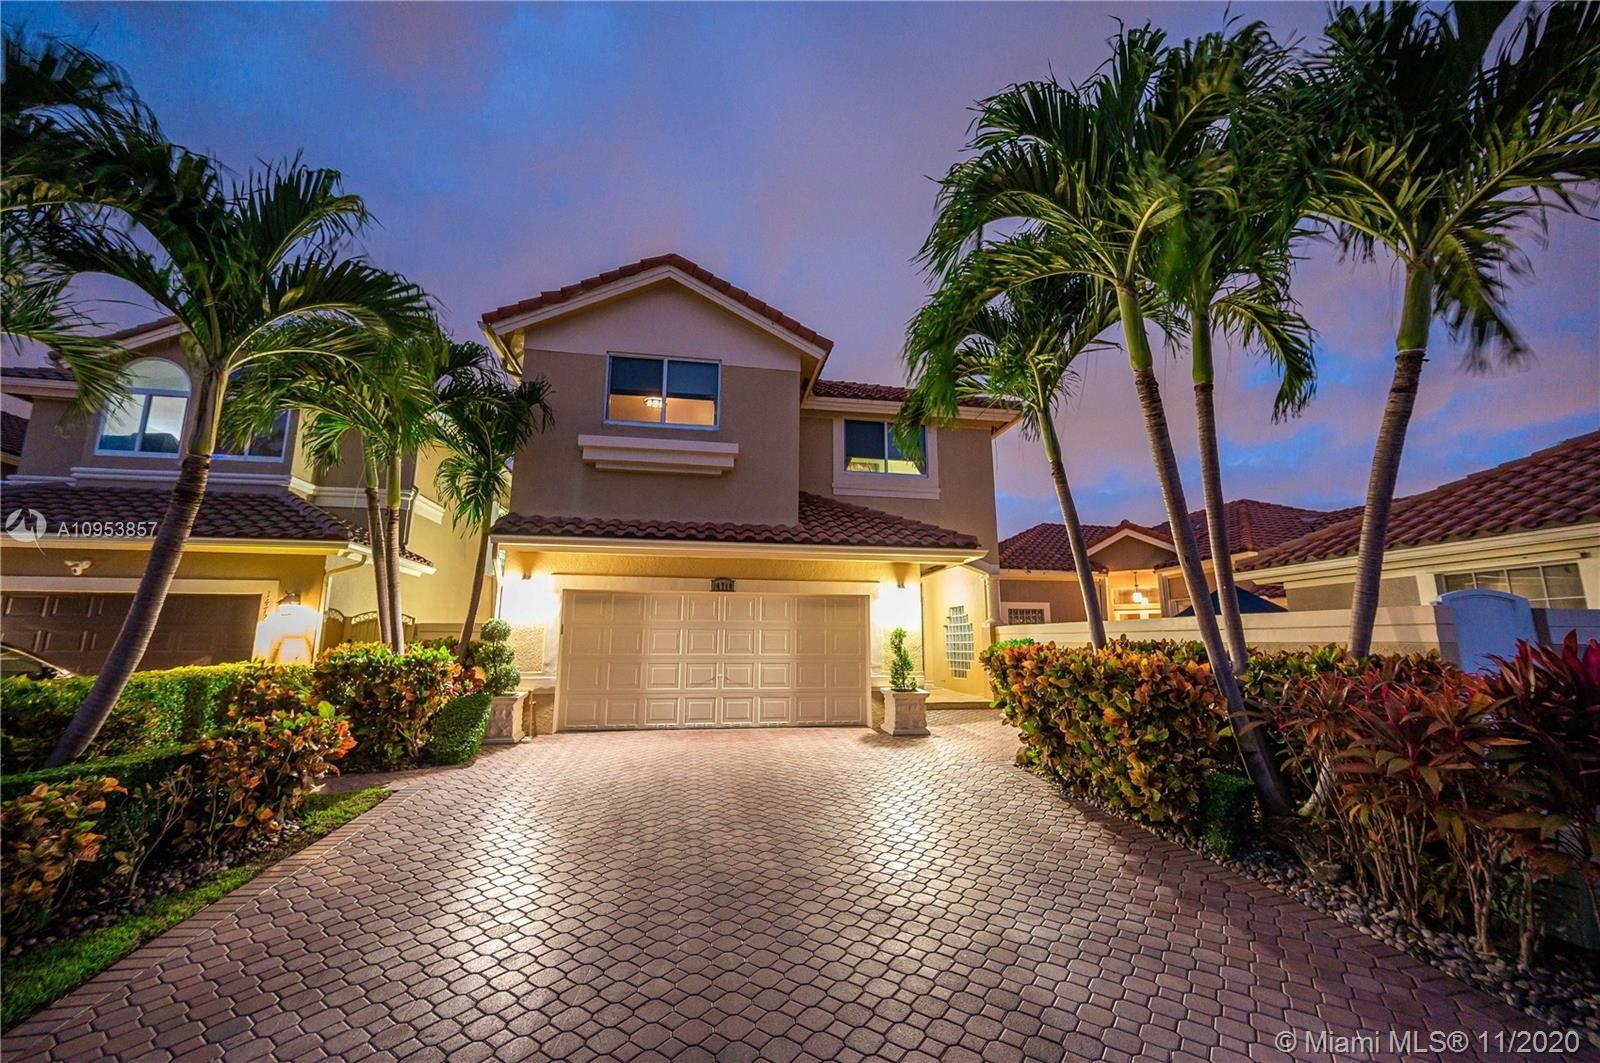 14718 SW 132nd Ave, Miami, FL 33186 - #: A10953857